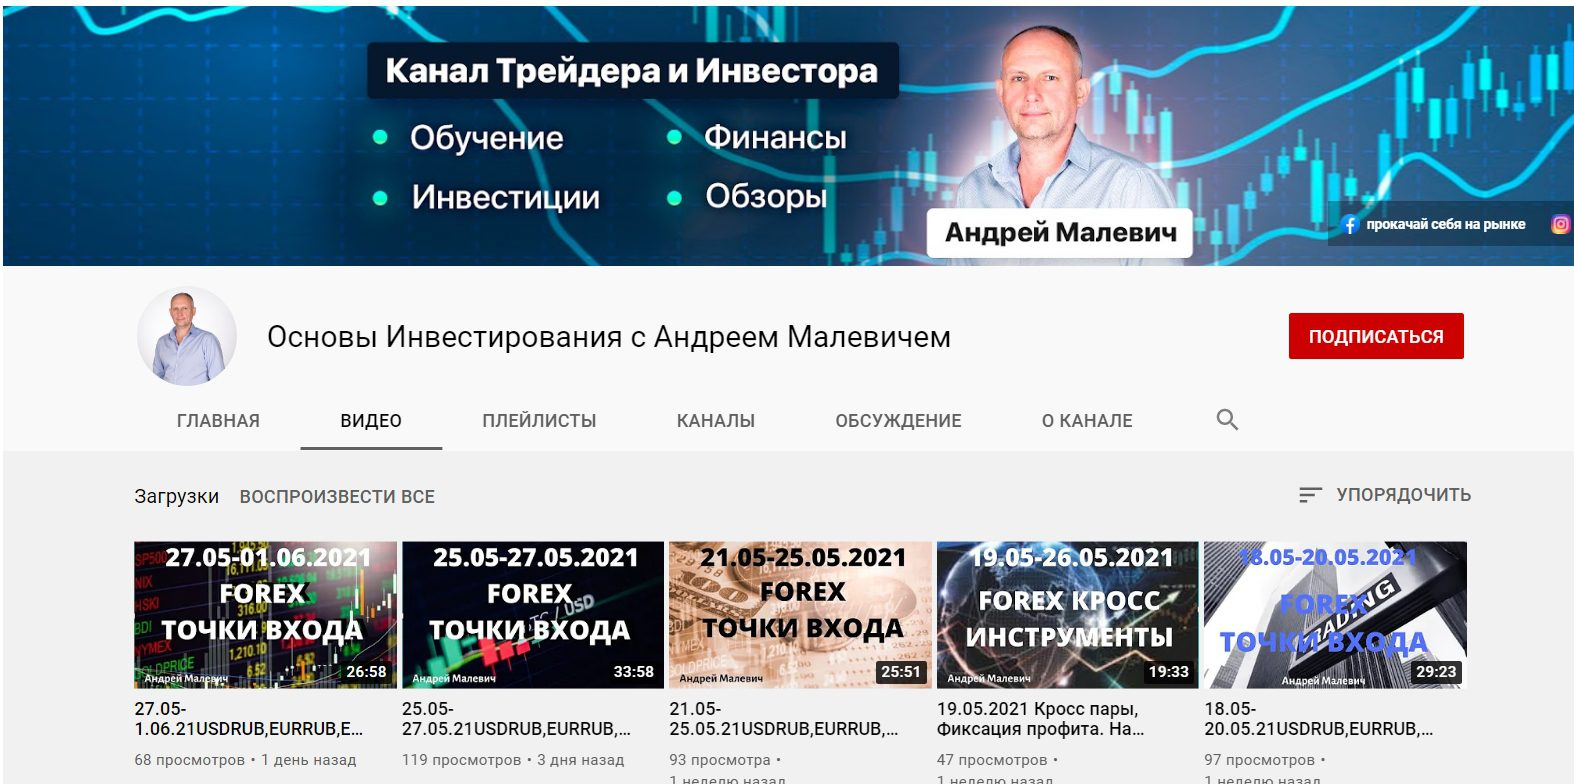 Канал на Ютубе трейдера Андрея Малевича